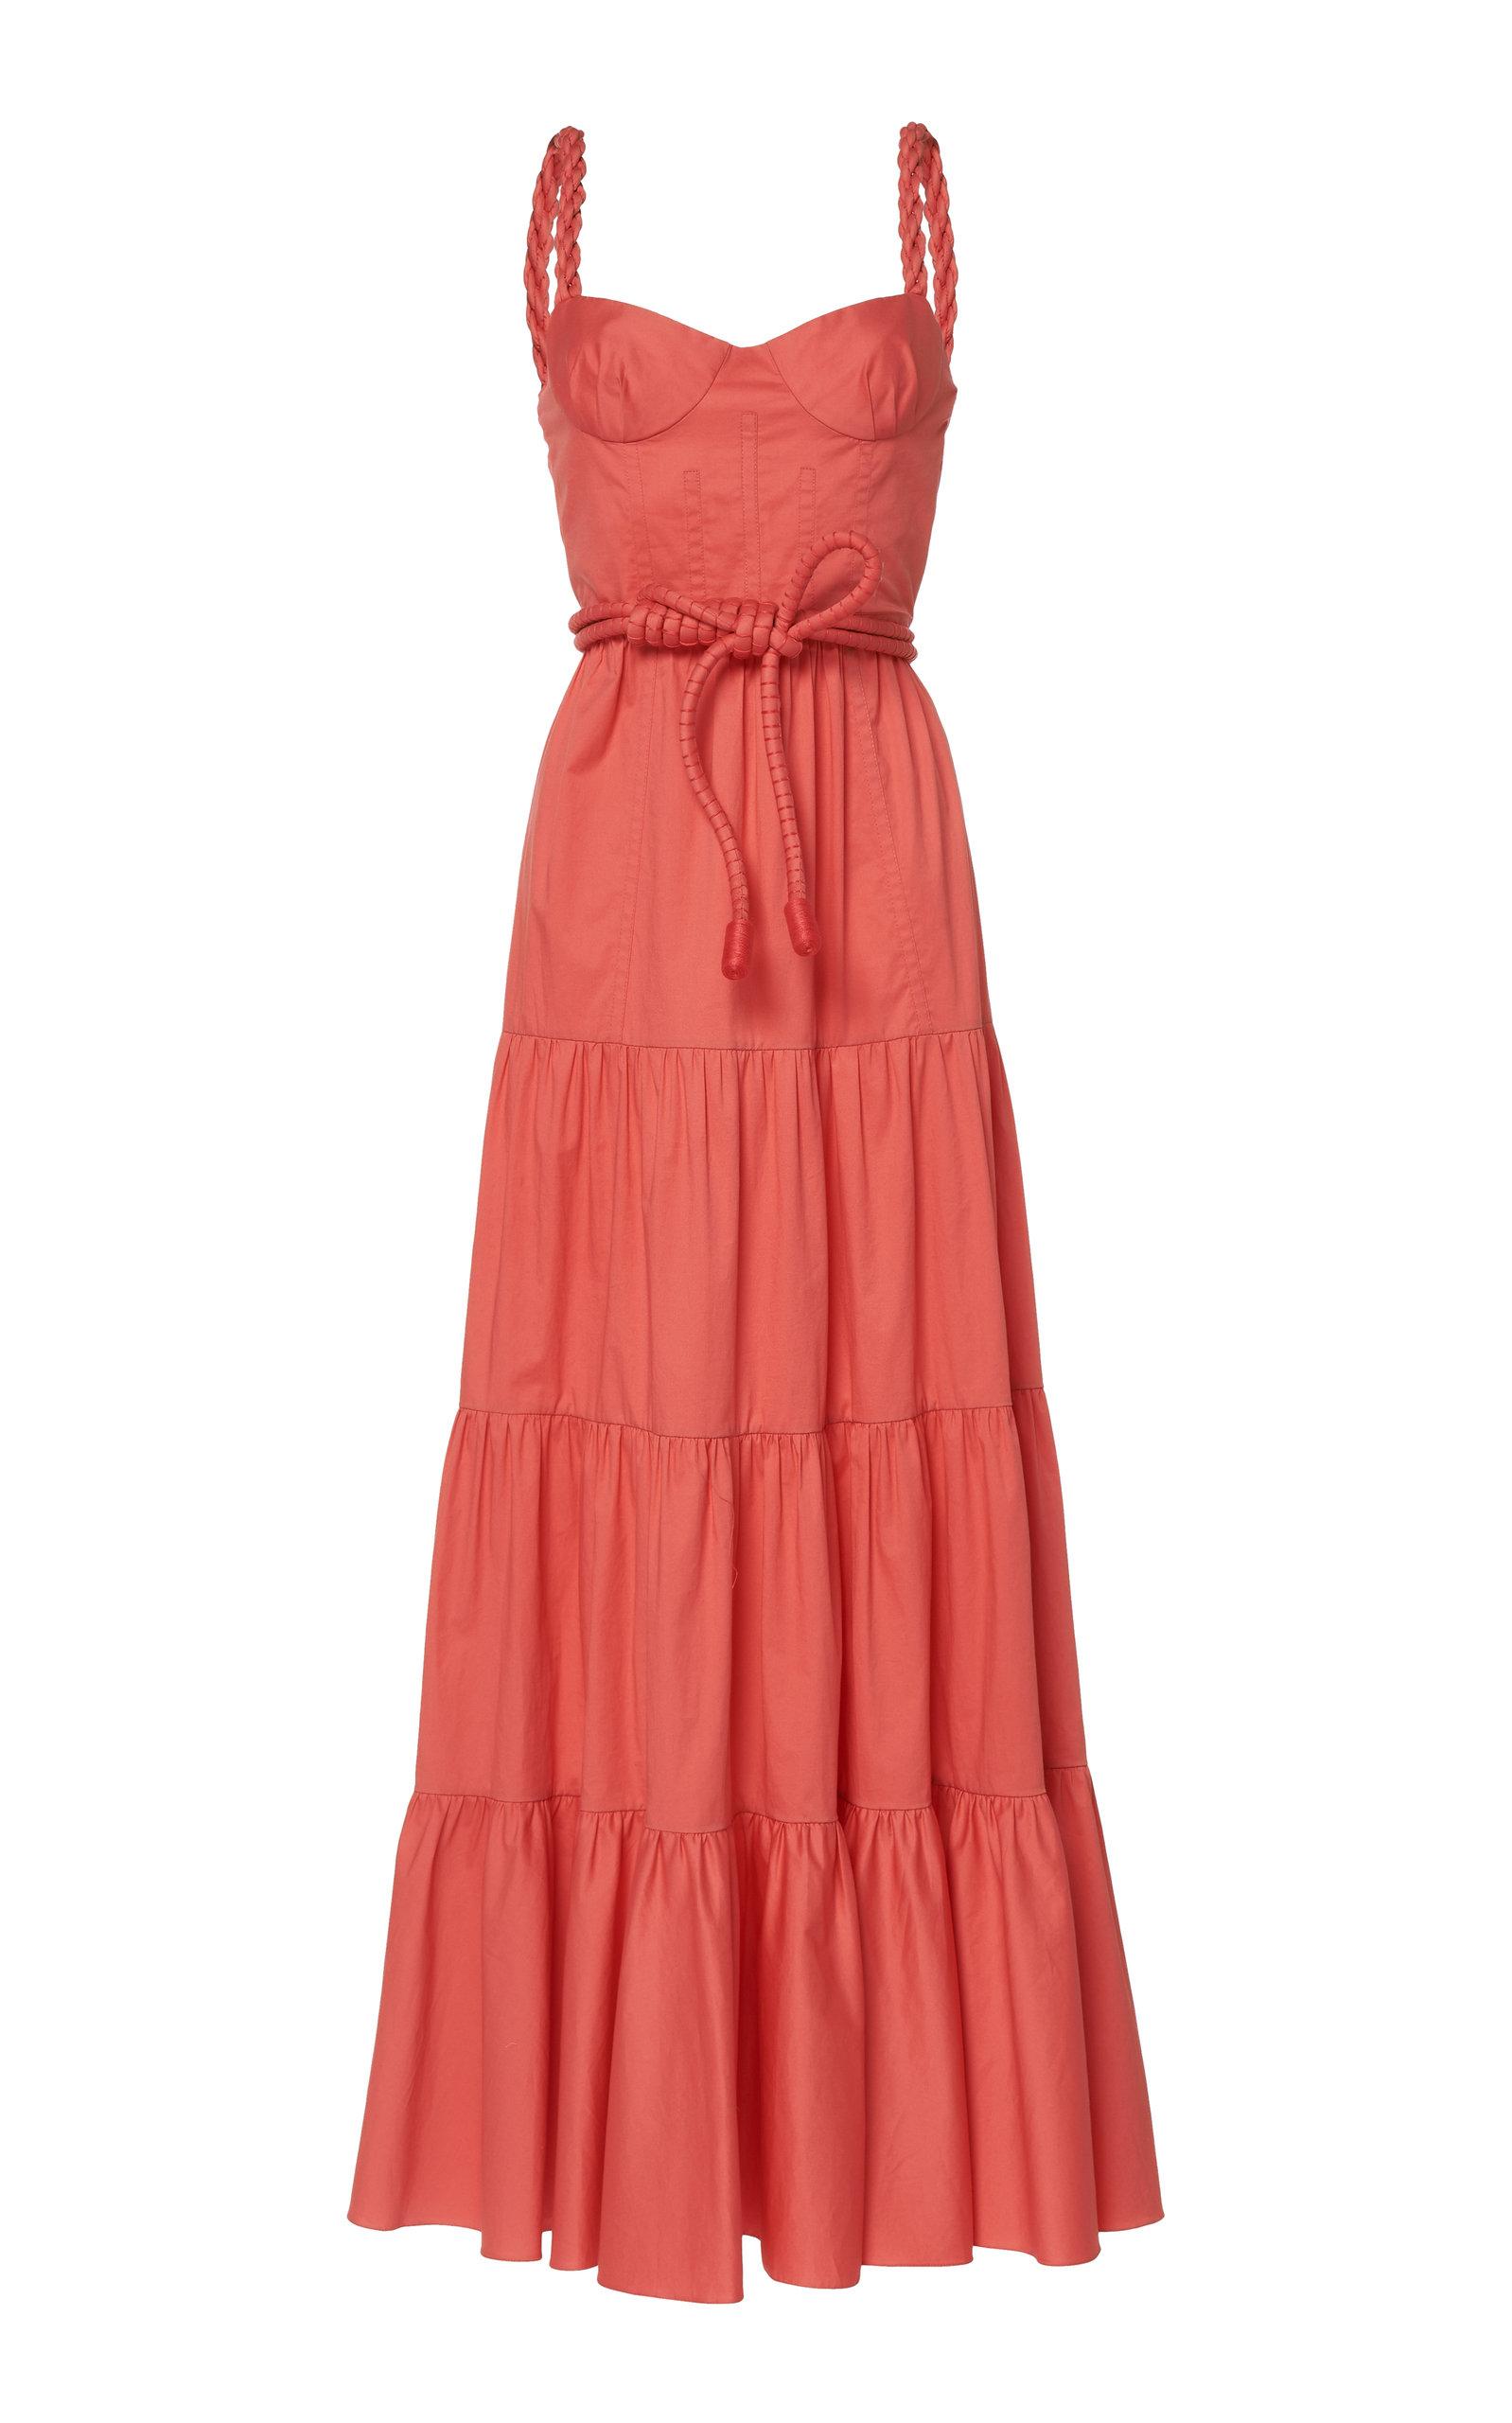 Buy Johanna Ortiz Calming Spirit Gathered Cotton-Blend Maxi Dress online, shop Johanna Ortiz at the best price